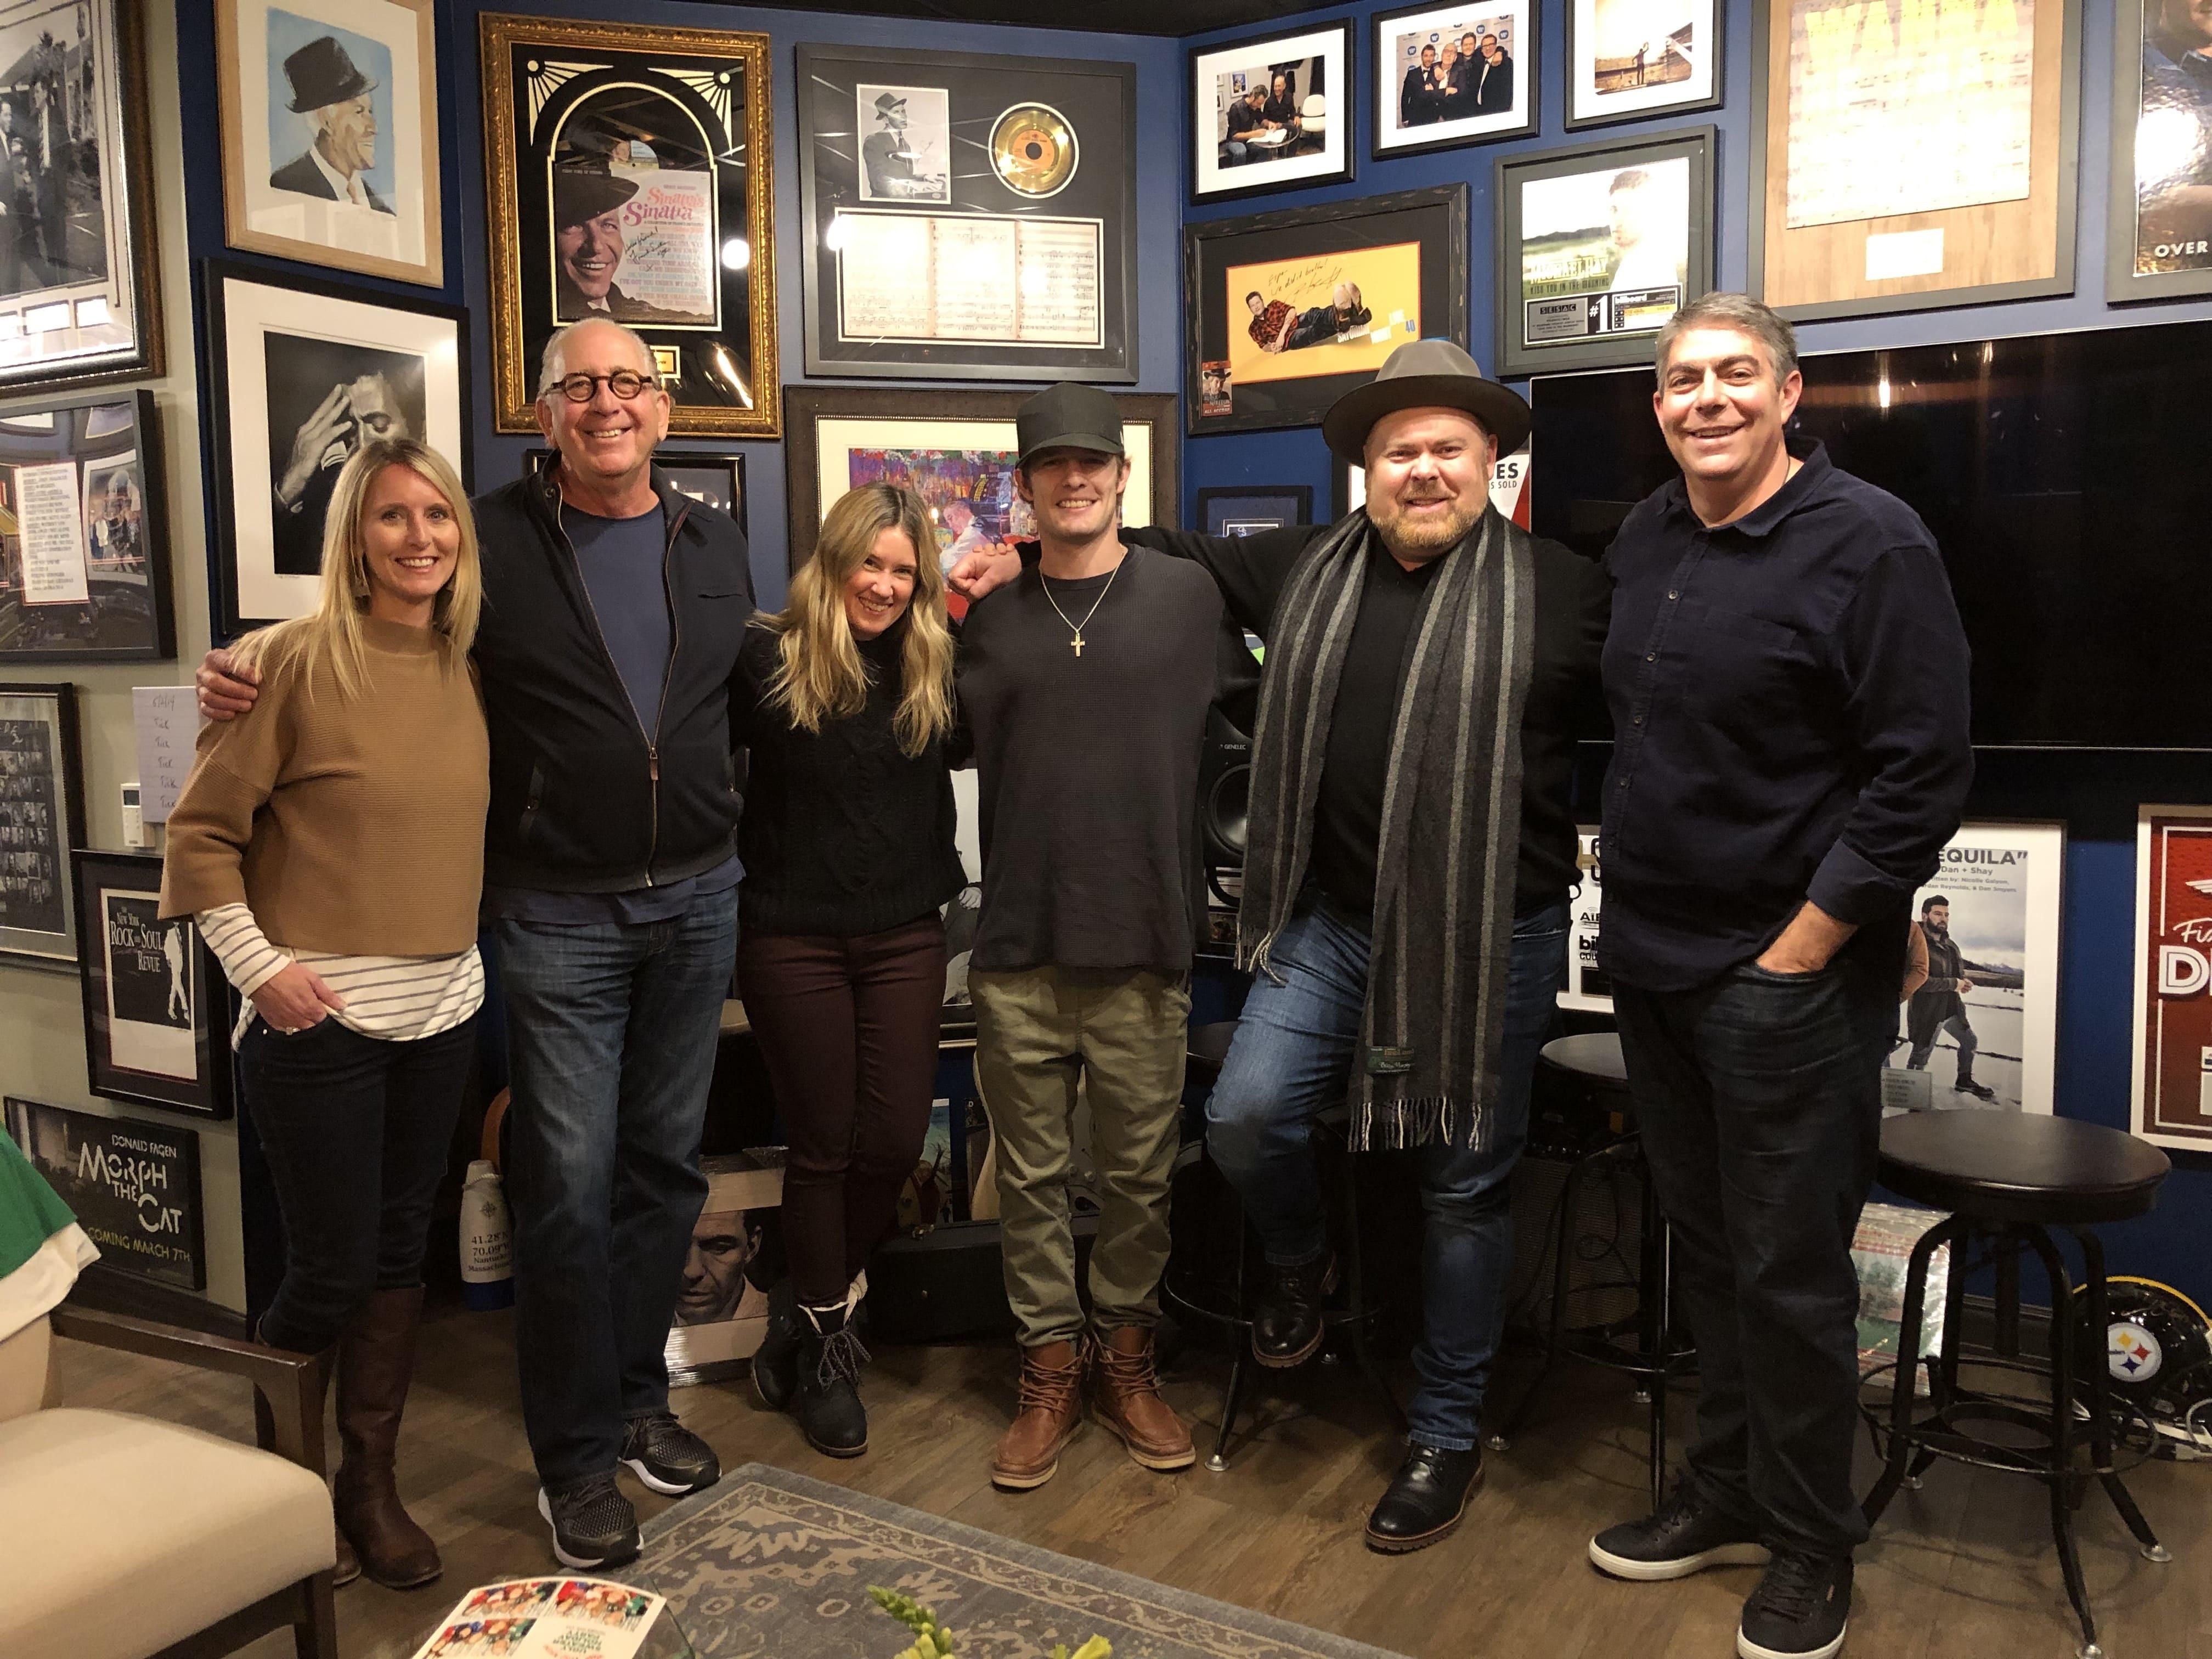 Photo ID (L-R): Kristen Williams (SVP Radio & Streaming); John Esposito (Chairman & CEO); Cris Lacy (SVP A&R); Tucker Beathard; Shane Tarleton (SVP Artist Development); Matt Signore (COO)